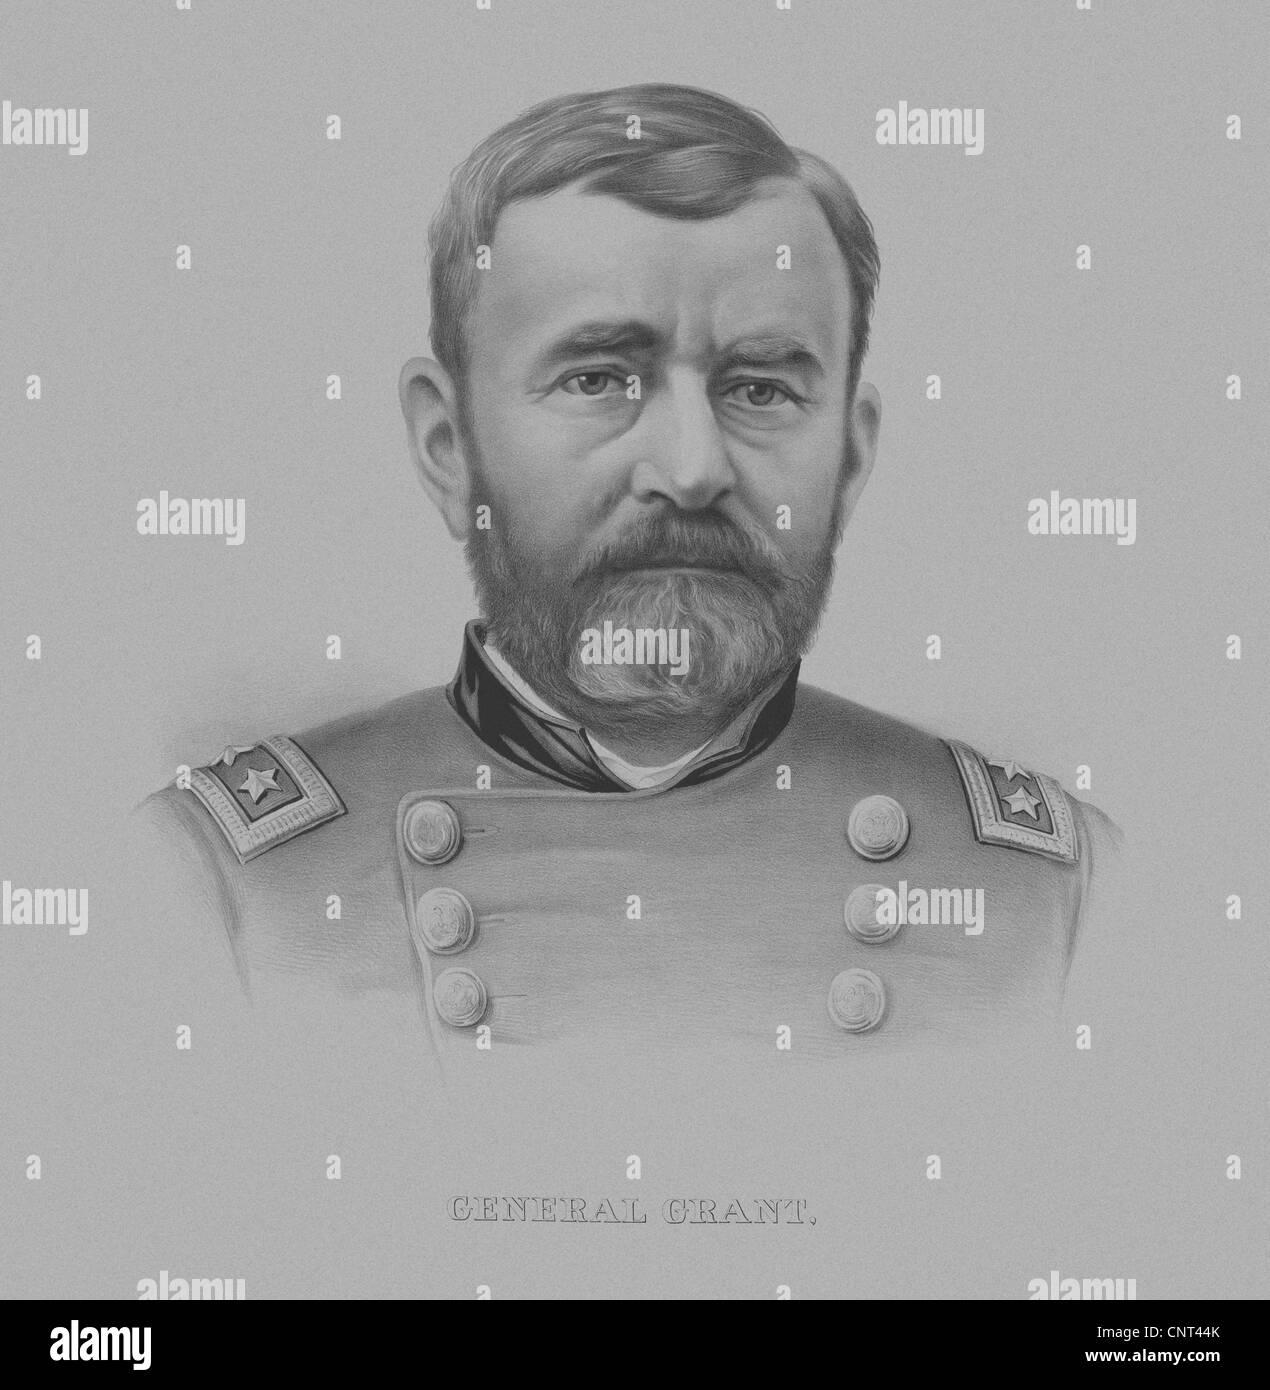 Vintage Civil War Print of General Ulysses S. Grant, wearing his military uniform. - Stock Image